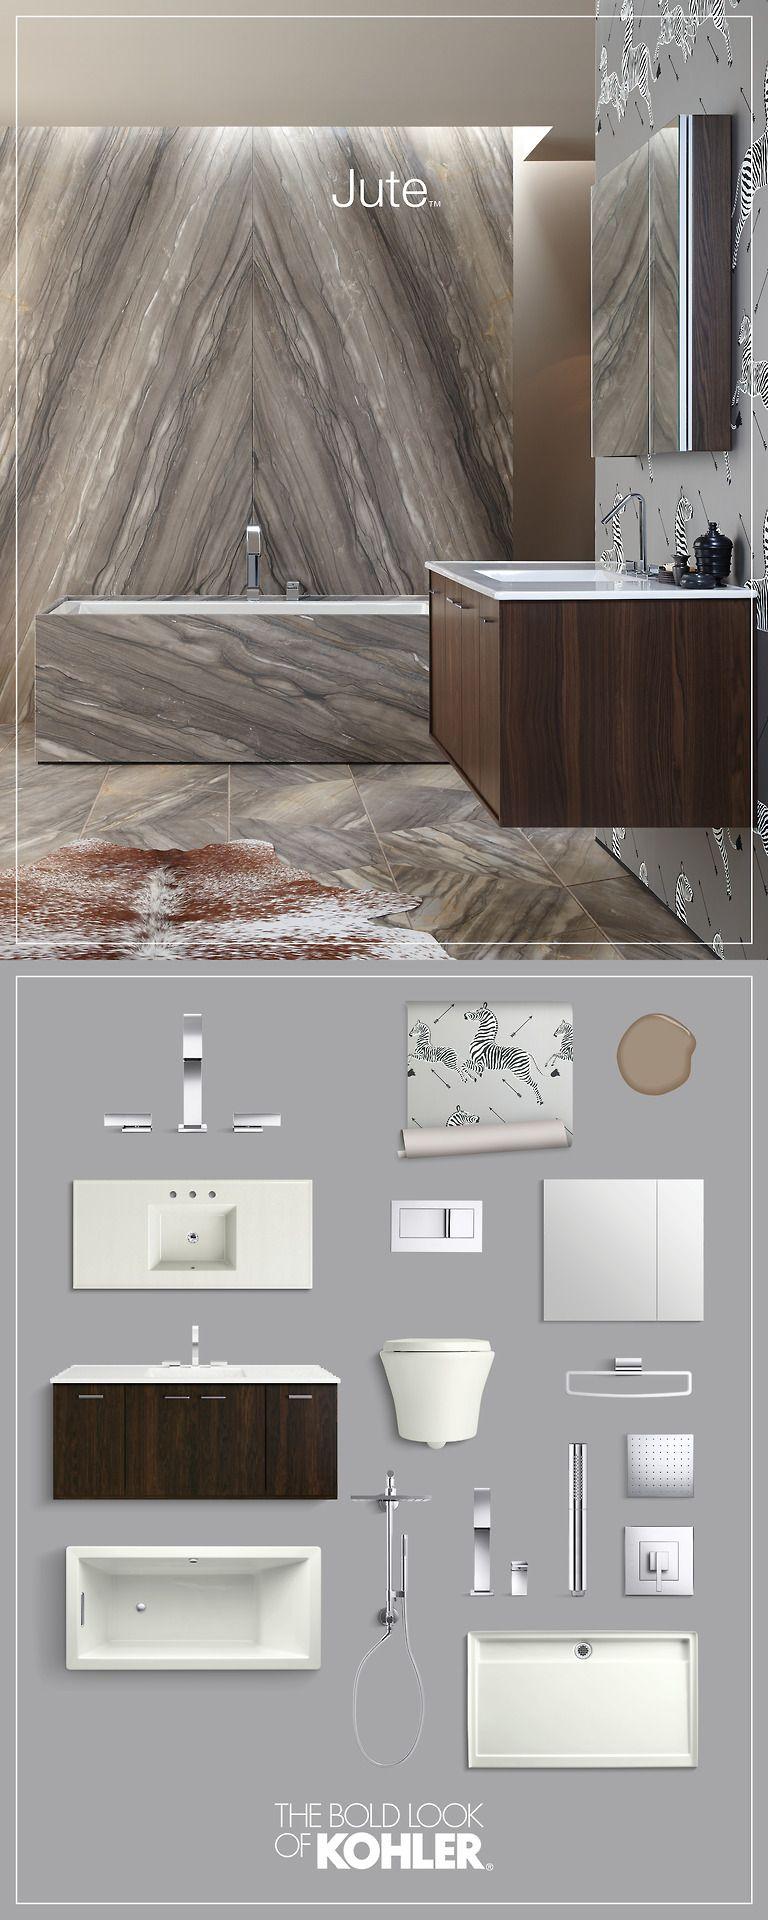 get the look - modern bathroom with kohler jute vanity | find this ... - Kohler Archer Lavabo Con Piedistallo